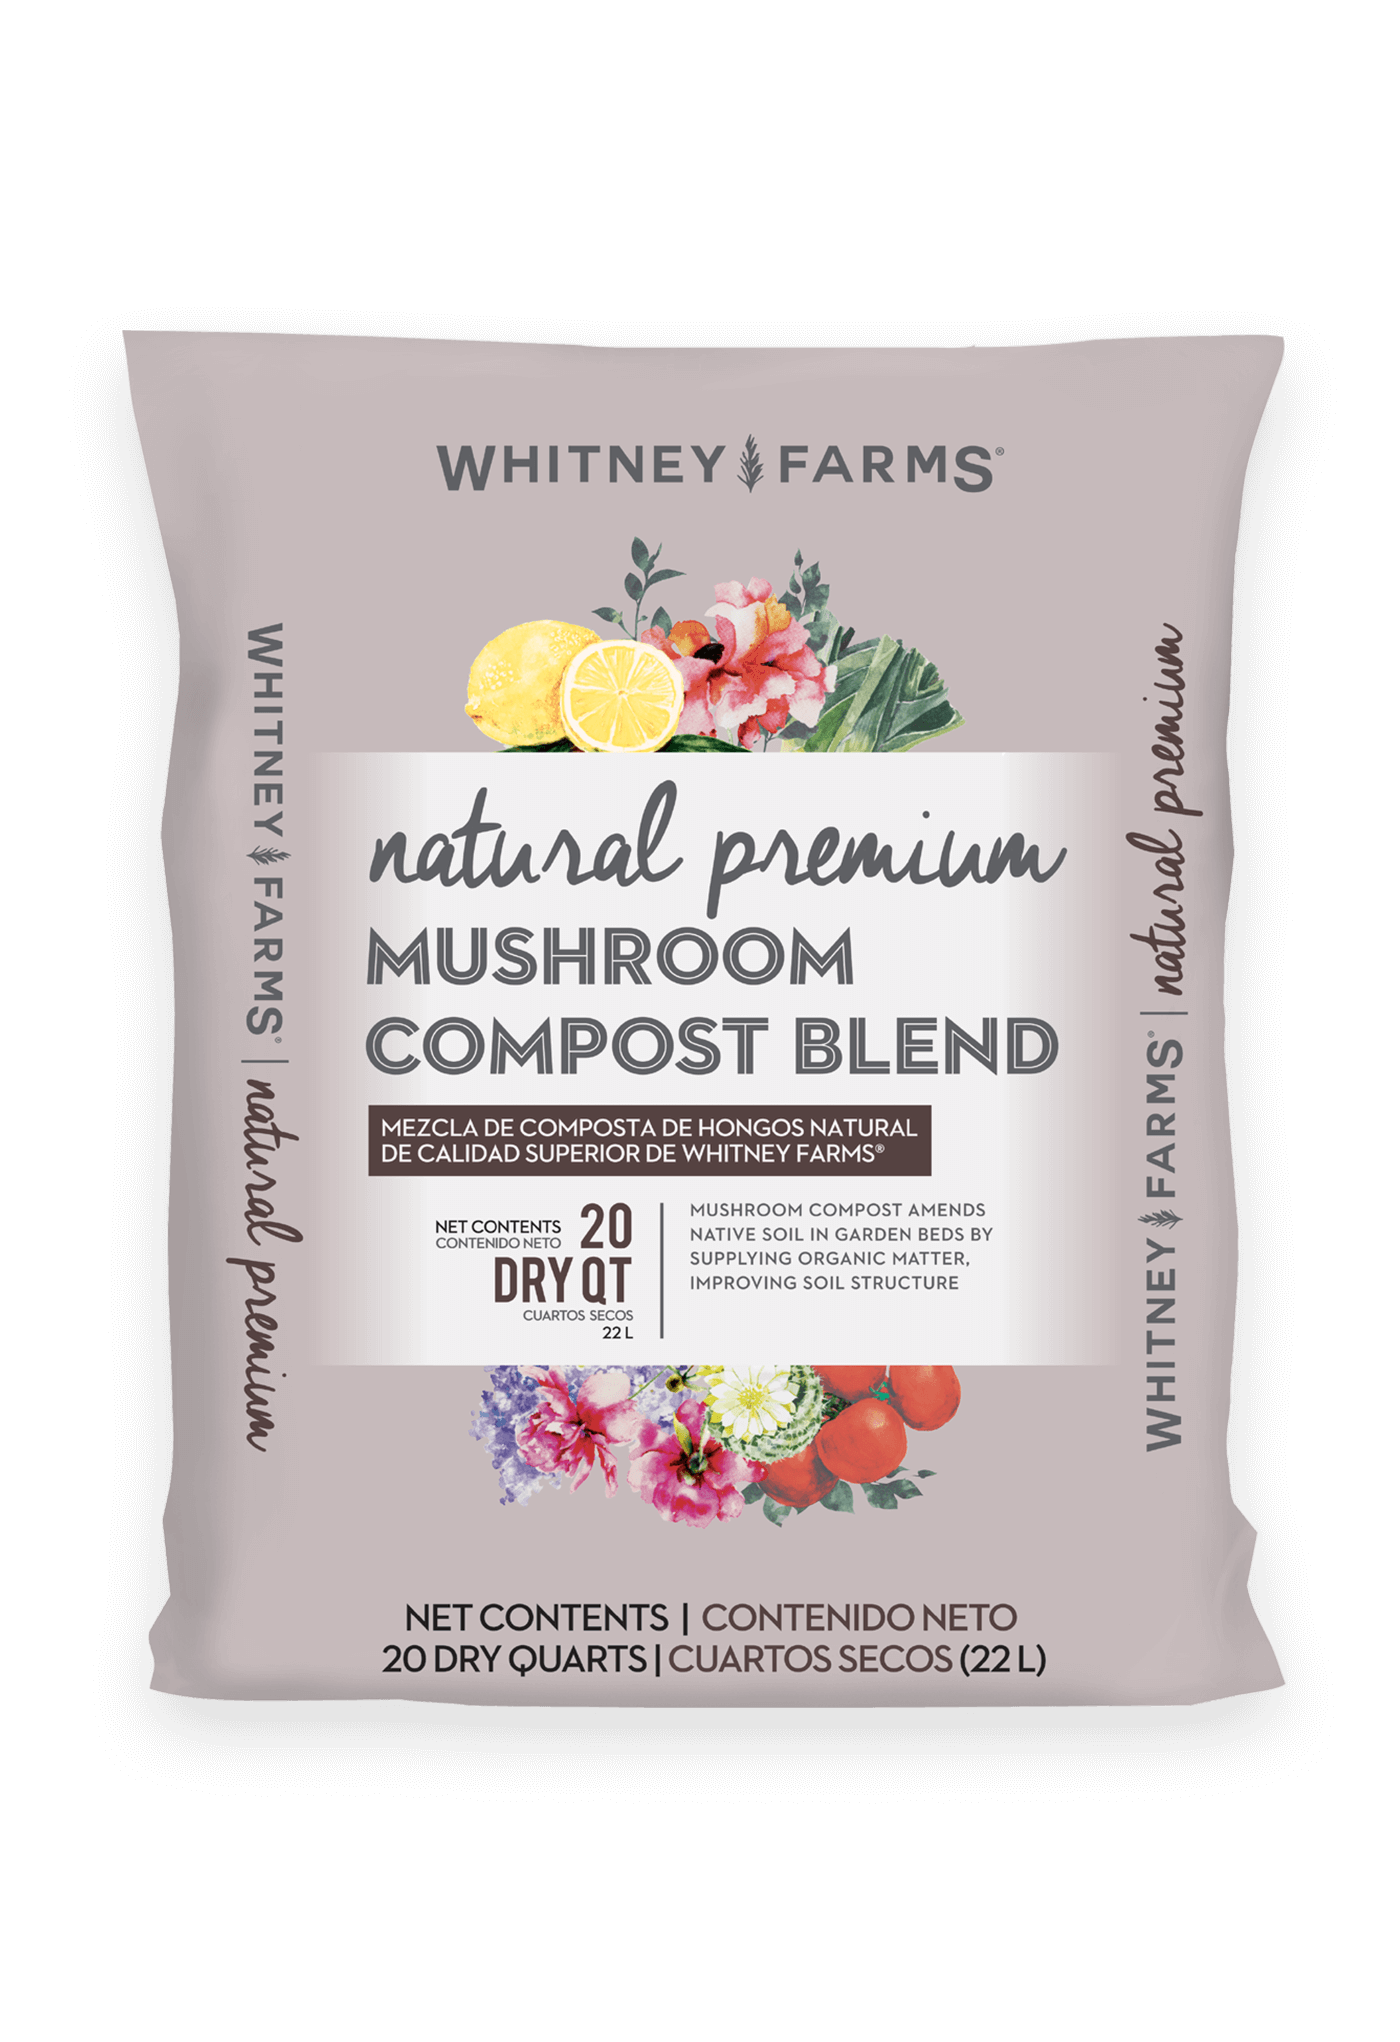 Mushroom Compost Blend